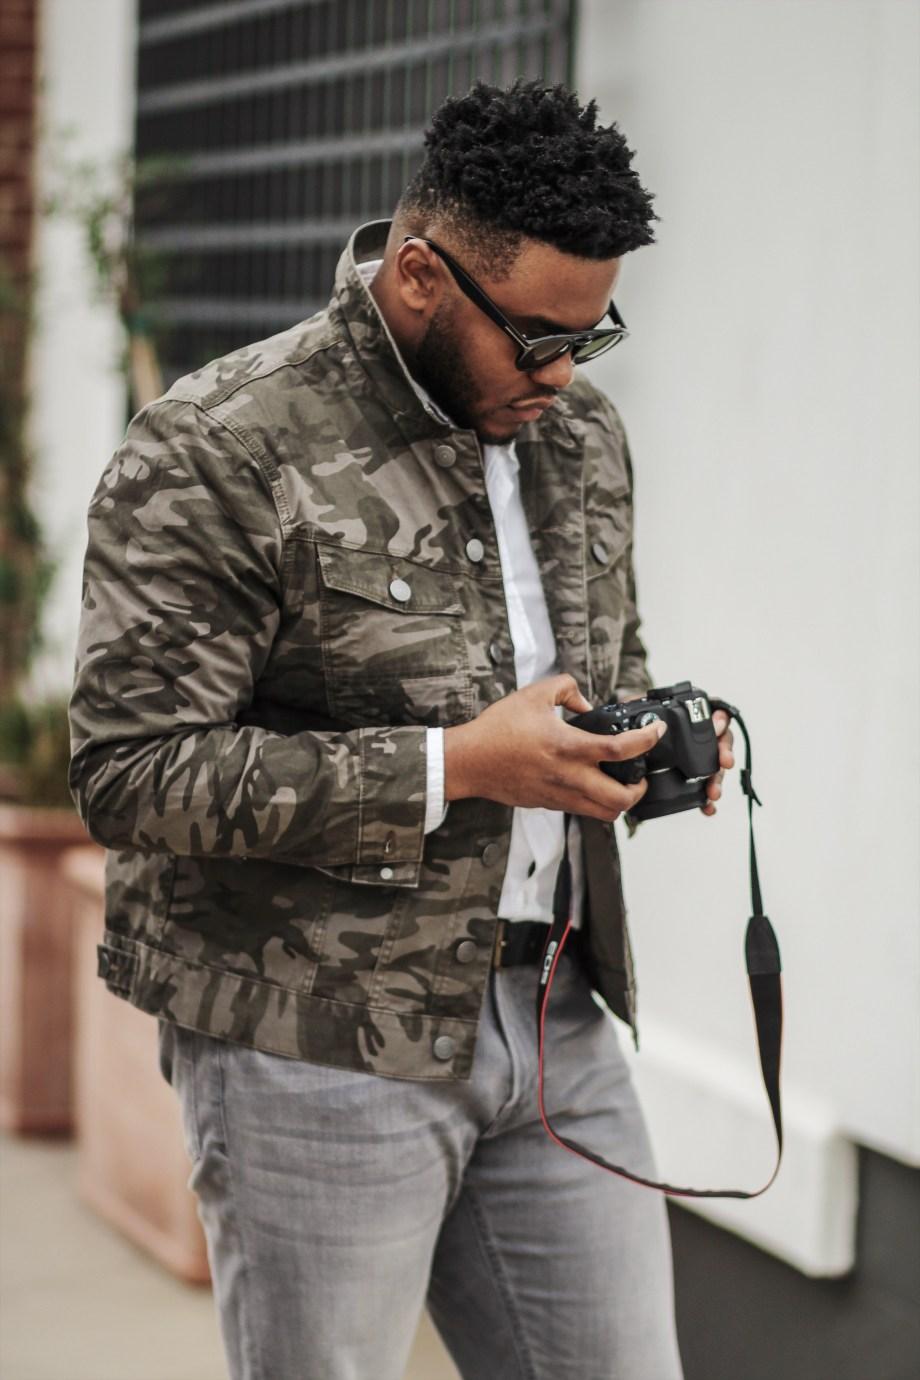 Best Camera Equipment for Beginning Bloggers